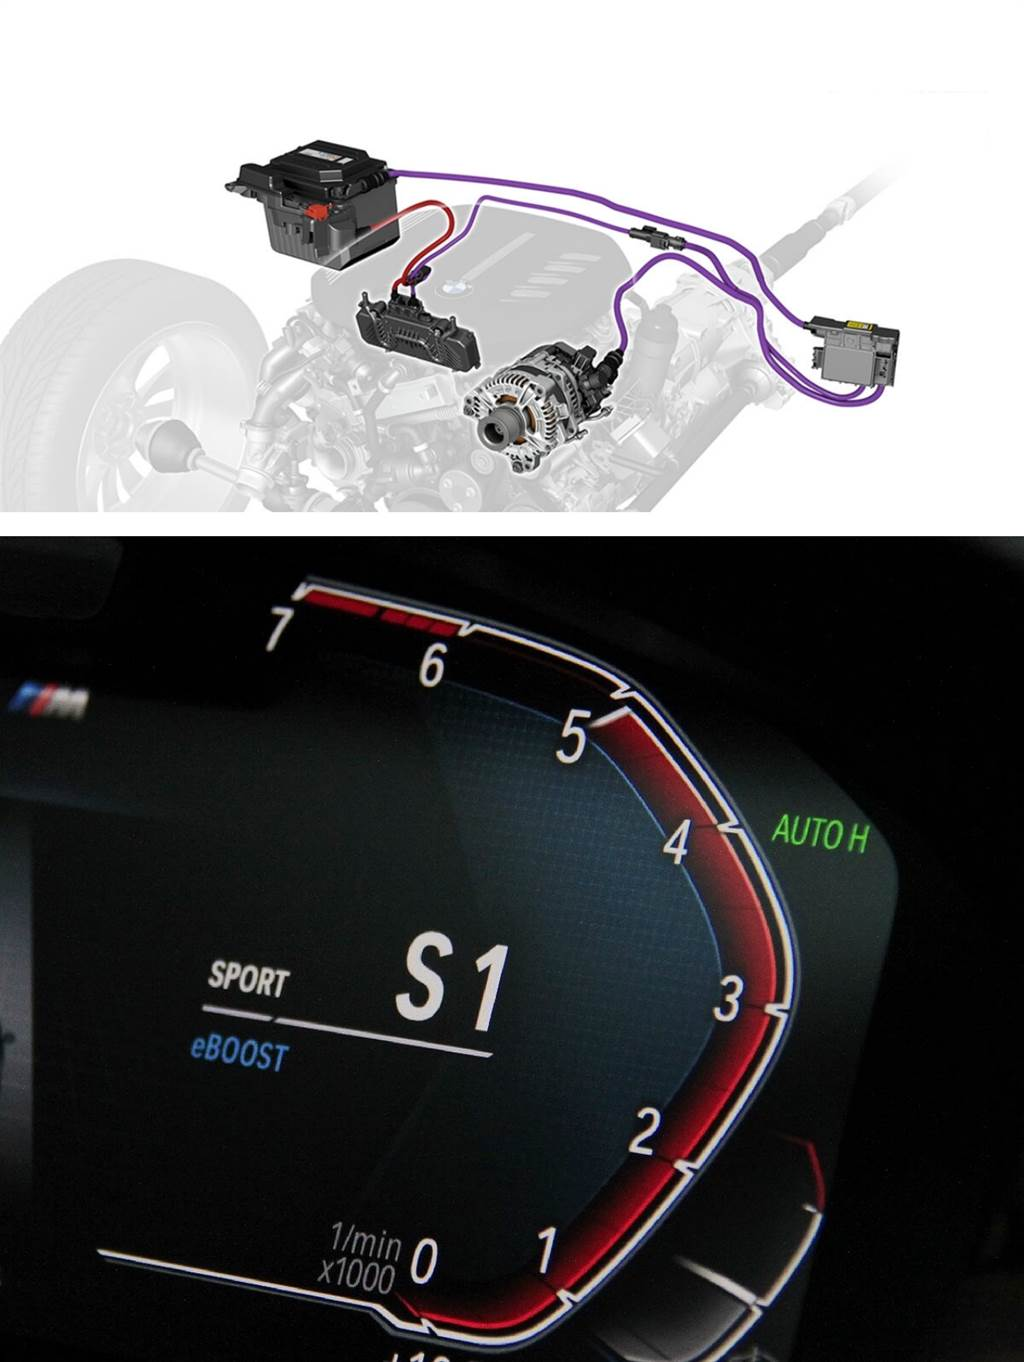 11 hp的eBoost衝刺輔助啟動時會在駕駛儀錶與中控螢幕車輛狀態顯示介面中提示,而這功能同樣也很依賴48V電池剩餘電量的多寡(可在中央螢幕顯示),由於所有包含靜止怠速時的用電,都是優先使用48V的電所以電很容易就會用盡(48V電池電量僅有11 Ah),而電太少時會無法啟動eBoost的衝刺輔助。不過,只要走走停停過個五至十分鐘,很快就會回充足夠的電了。